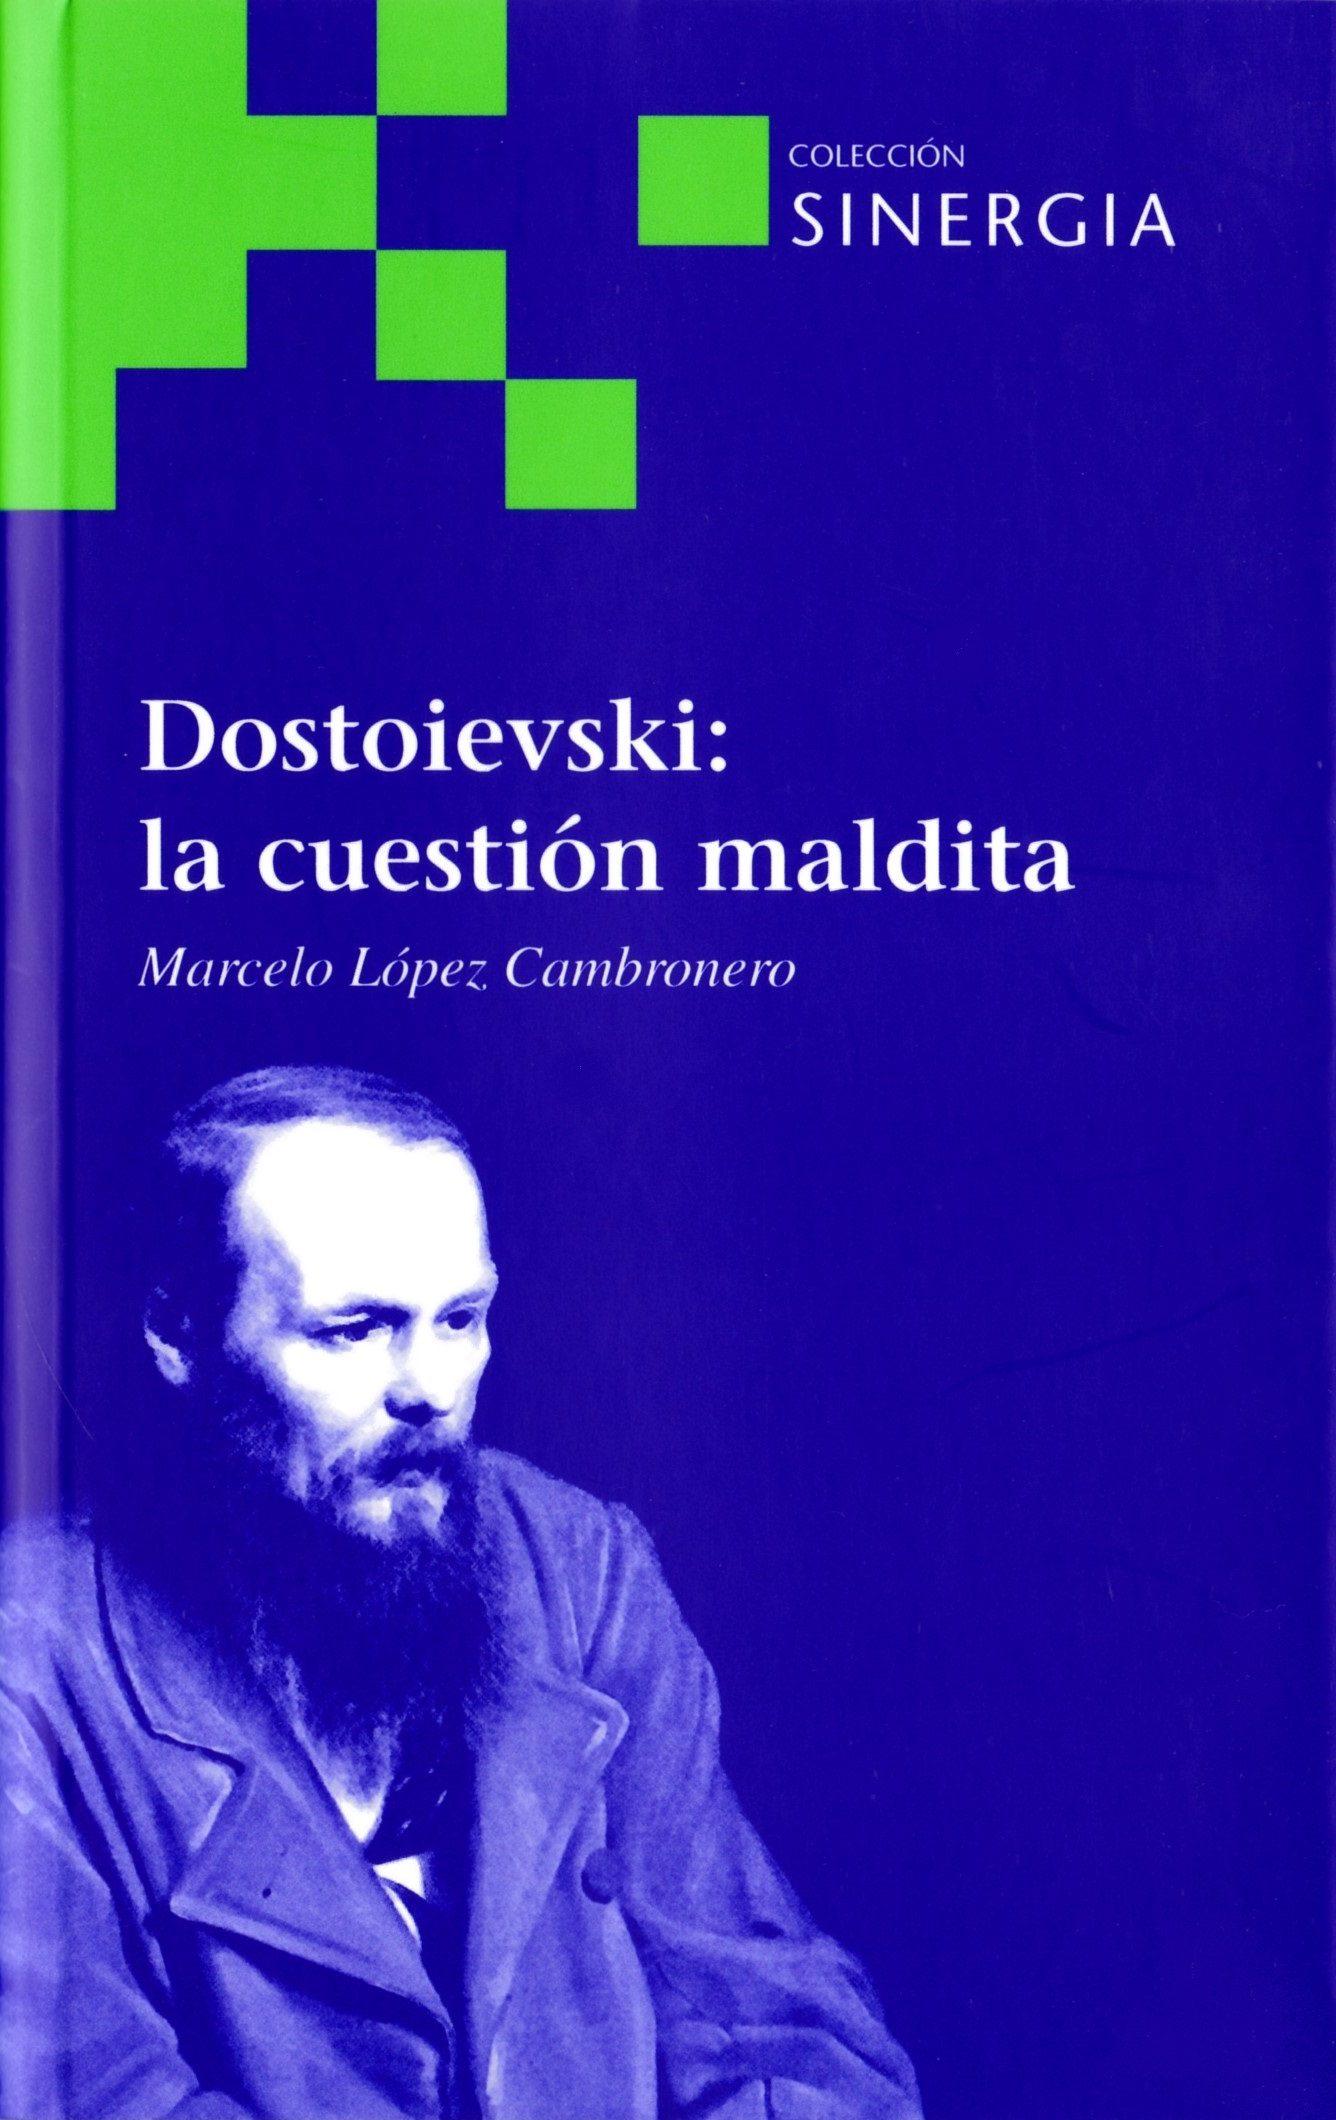 Dostoievski: La Cuestion Maldita por Marcelo Lopez Cambronero